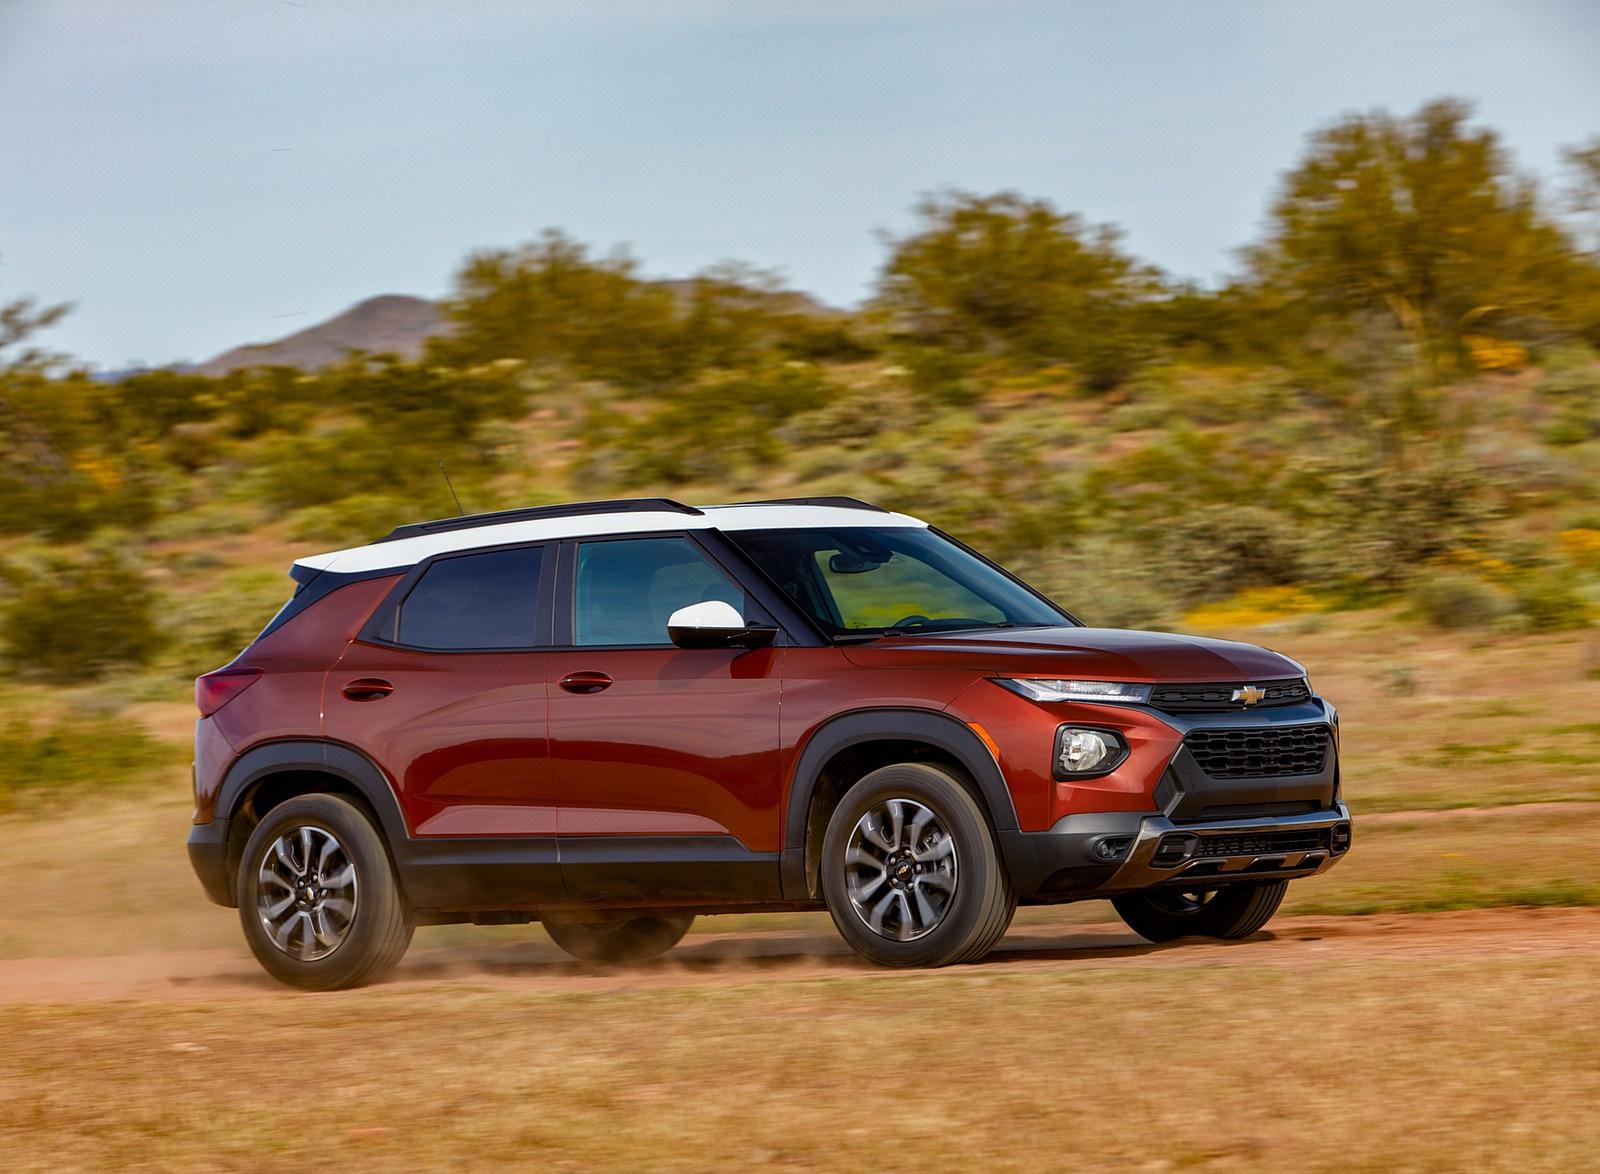 2021 Chevrolet Trailblazer ACTIV Front Three-Quarter Wallpapers (3)